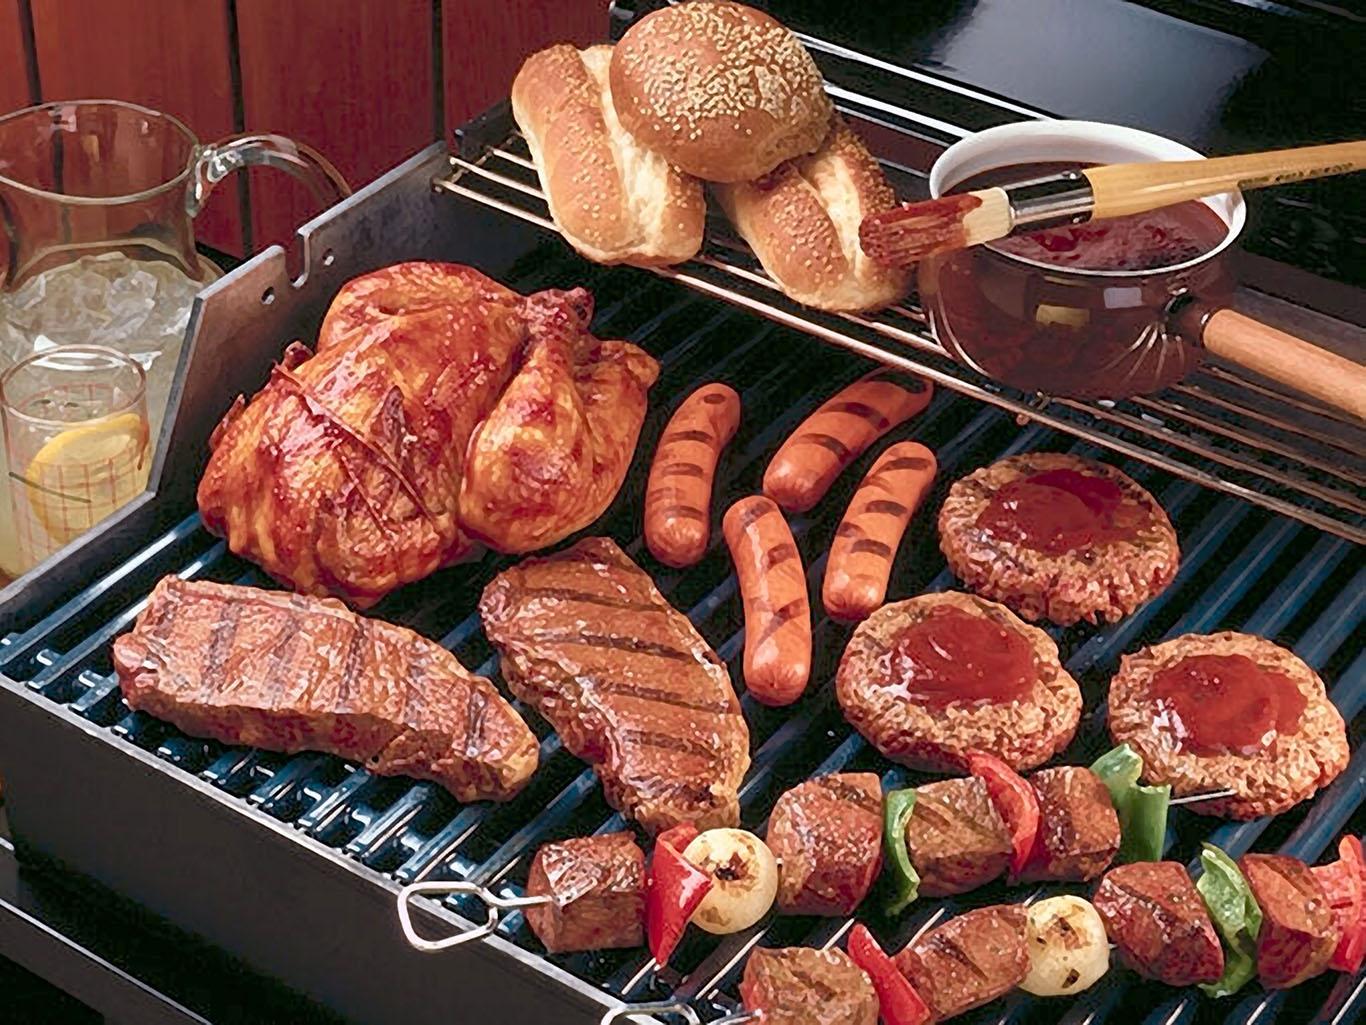 Все тонкости приготовления еды на гриле - Мужчина на кухне - Питание - MEN's LIFE